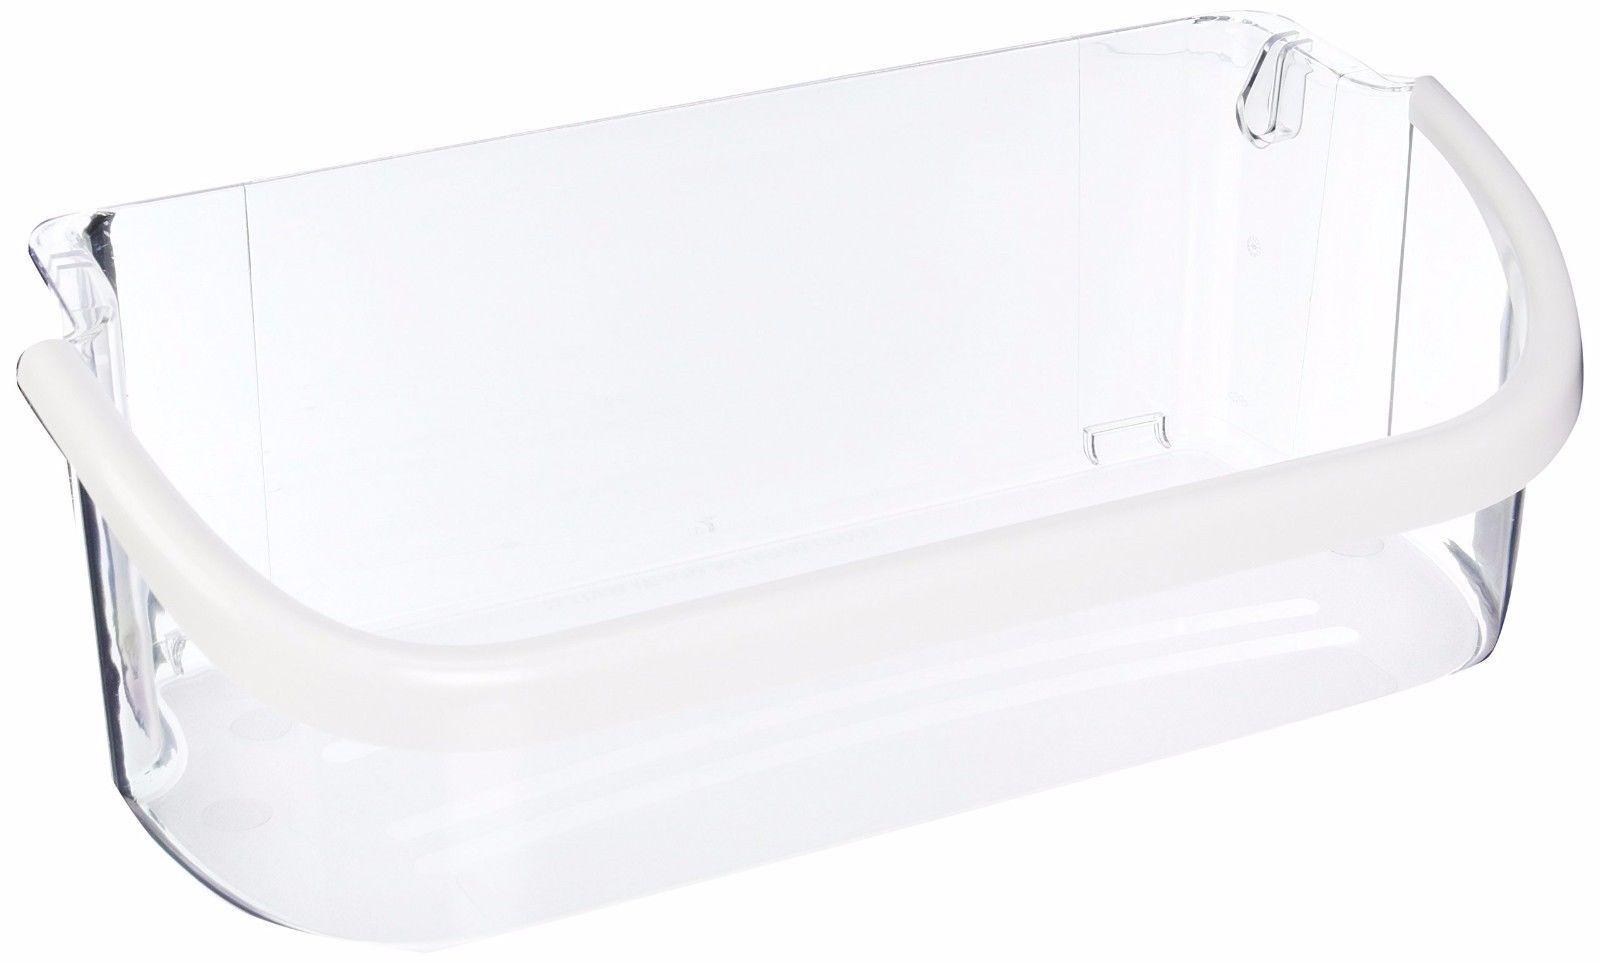 241808205 Frigidaire Refrigerator Door Bin - $52.24  sc 1 st  Bonanza & Frigidaire Refrigerator Door Bin: 1 customer review and 6 listings